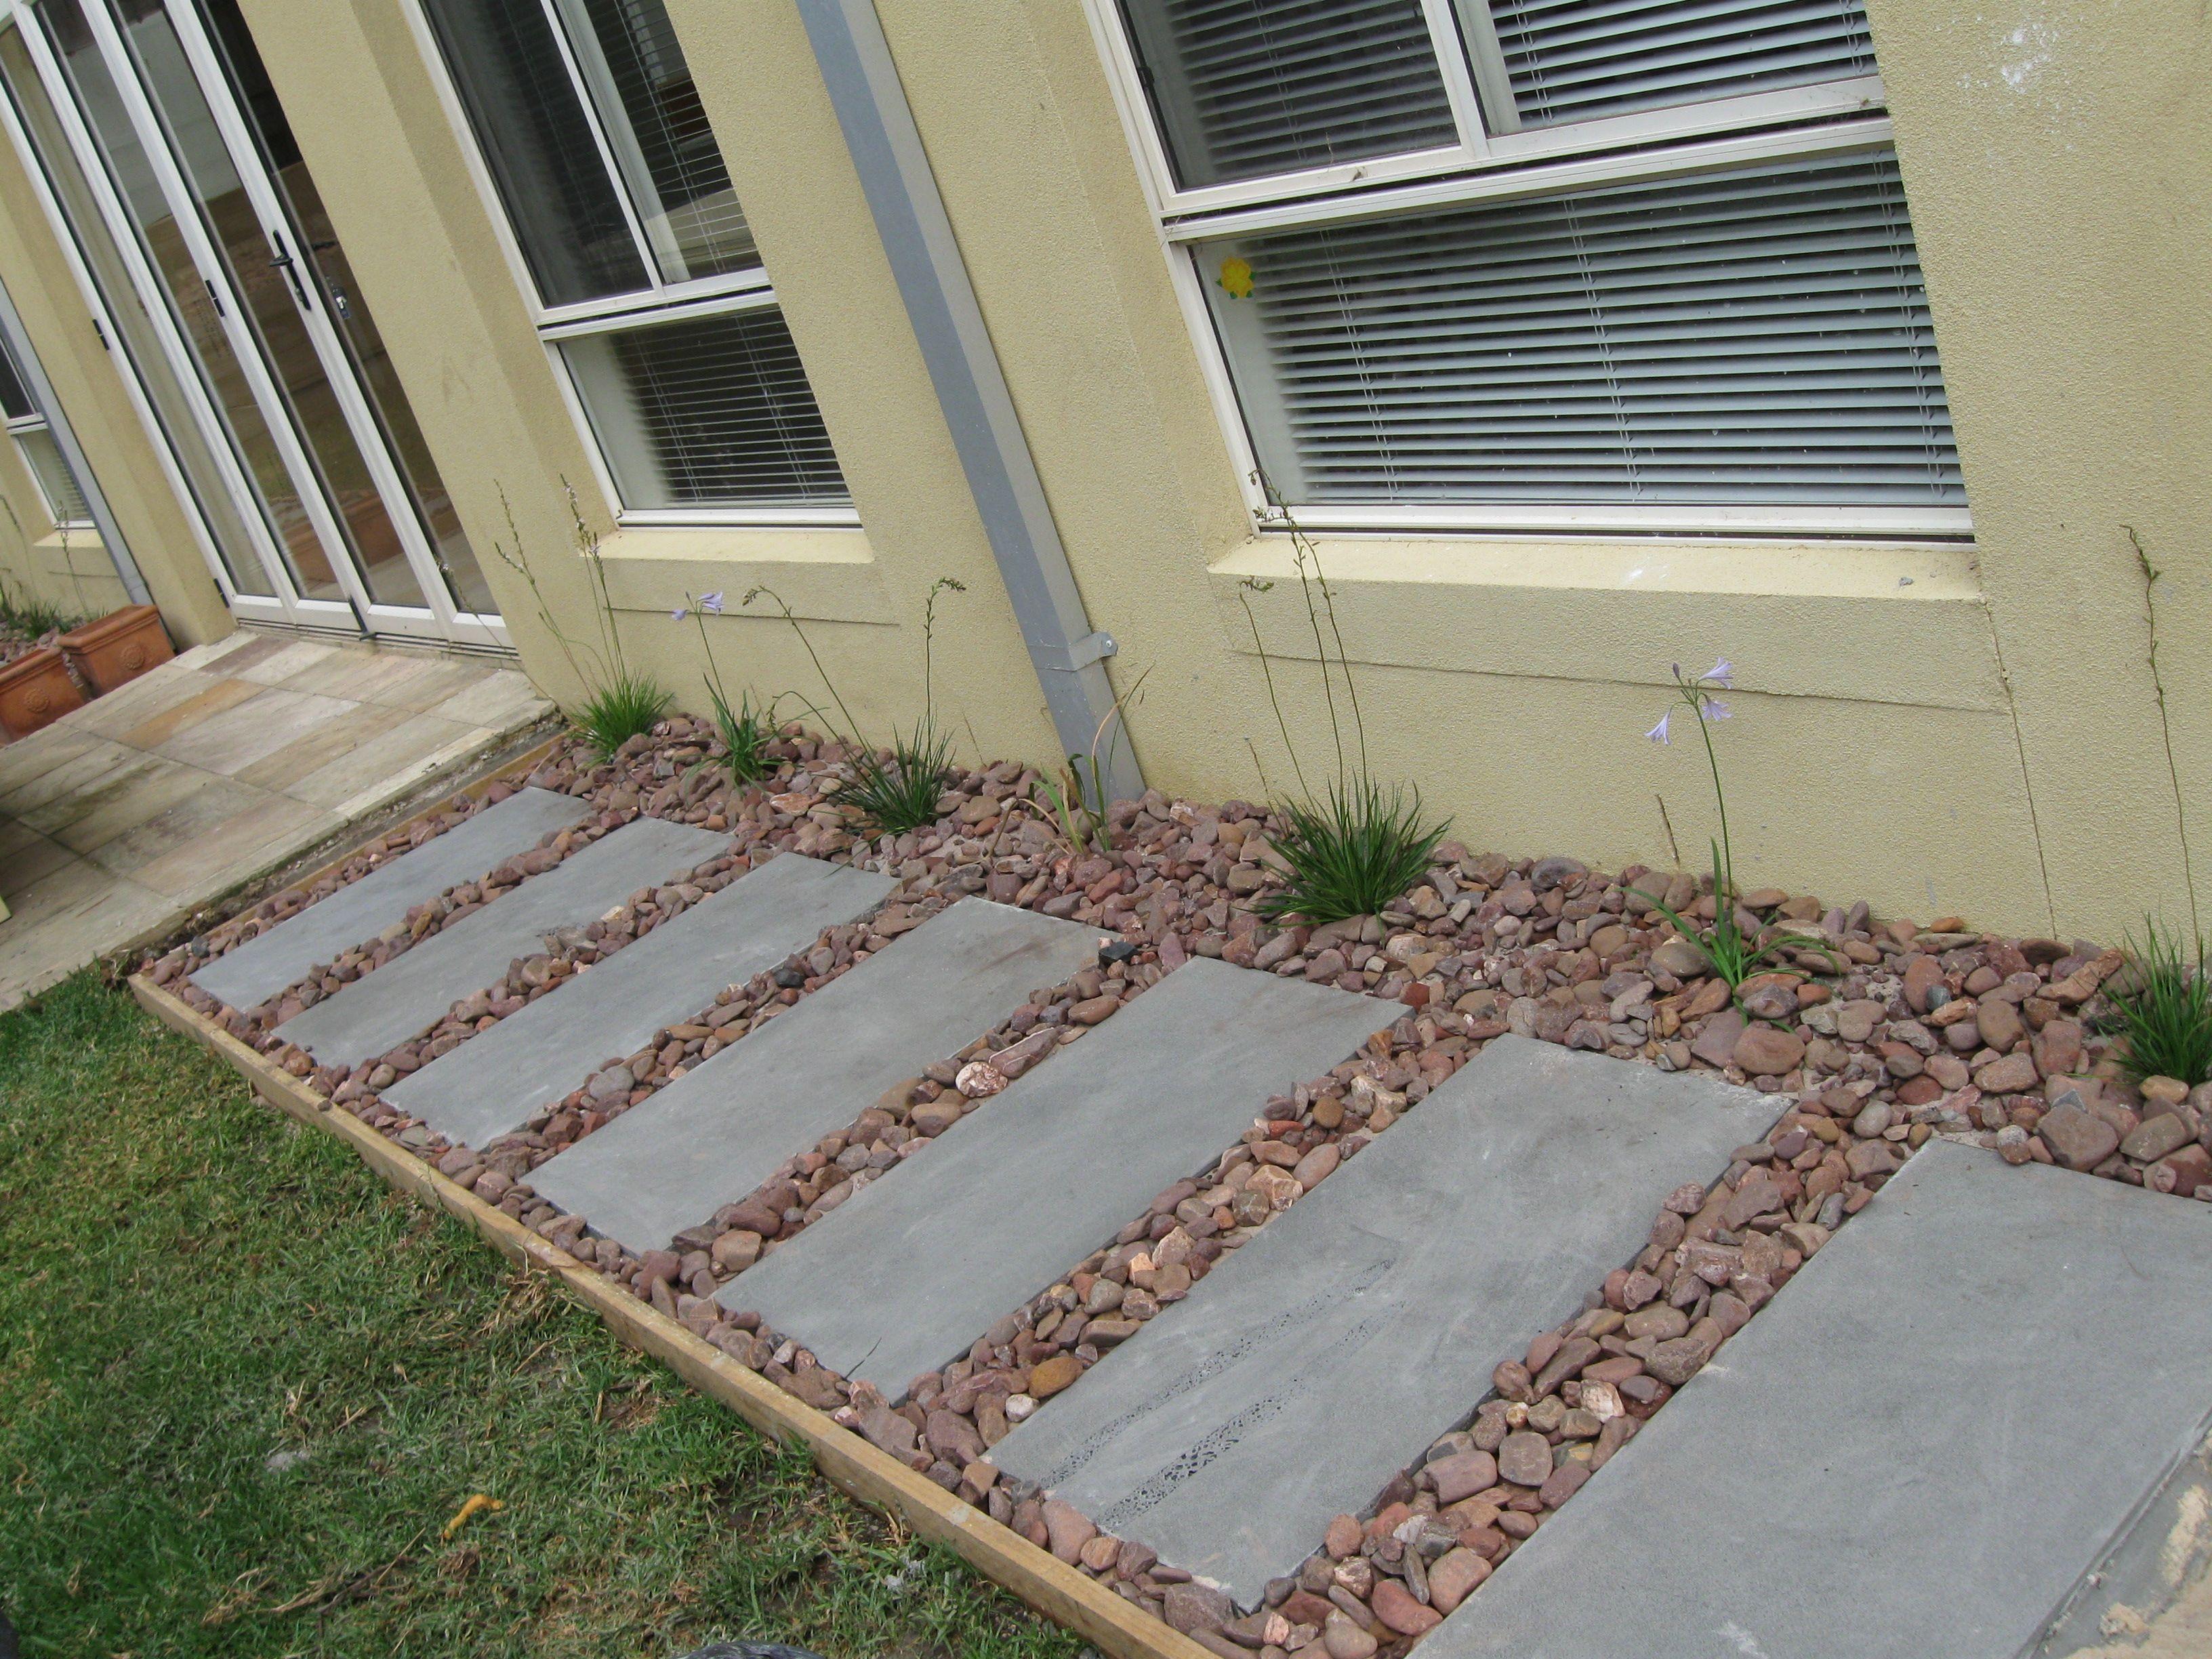 Small Backyard Makeover Ideas-1 | Small backyard ... on Small Backyard Renovation Ideas id=84180